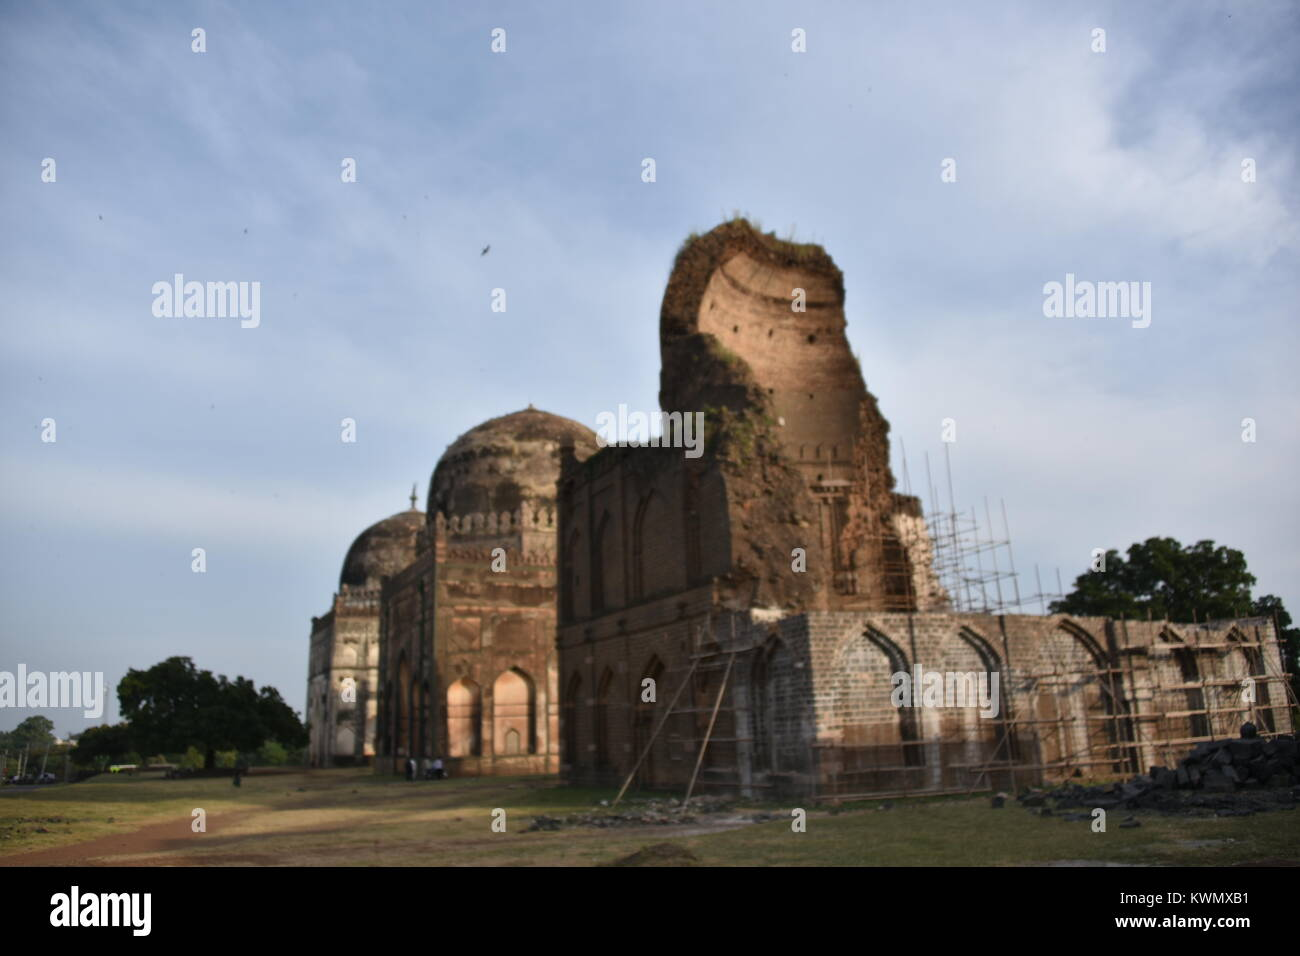 The tombs of Bahamani rulers, Bidar, Karnataka, India - Stock Image